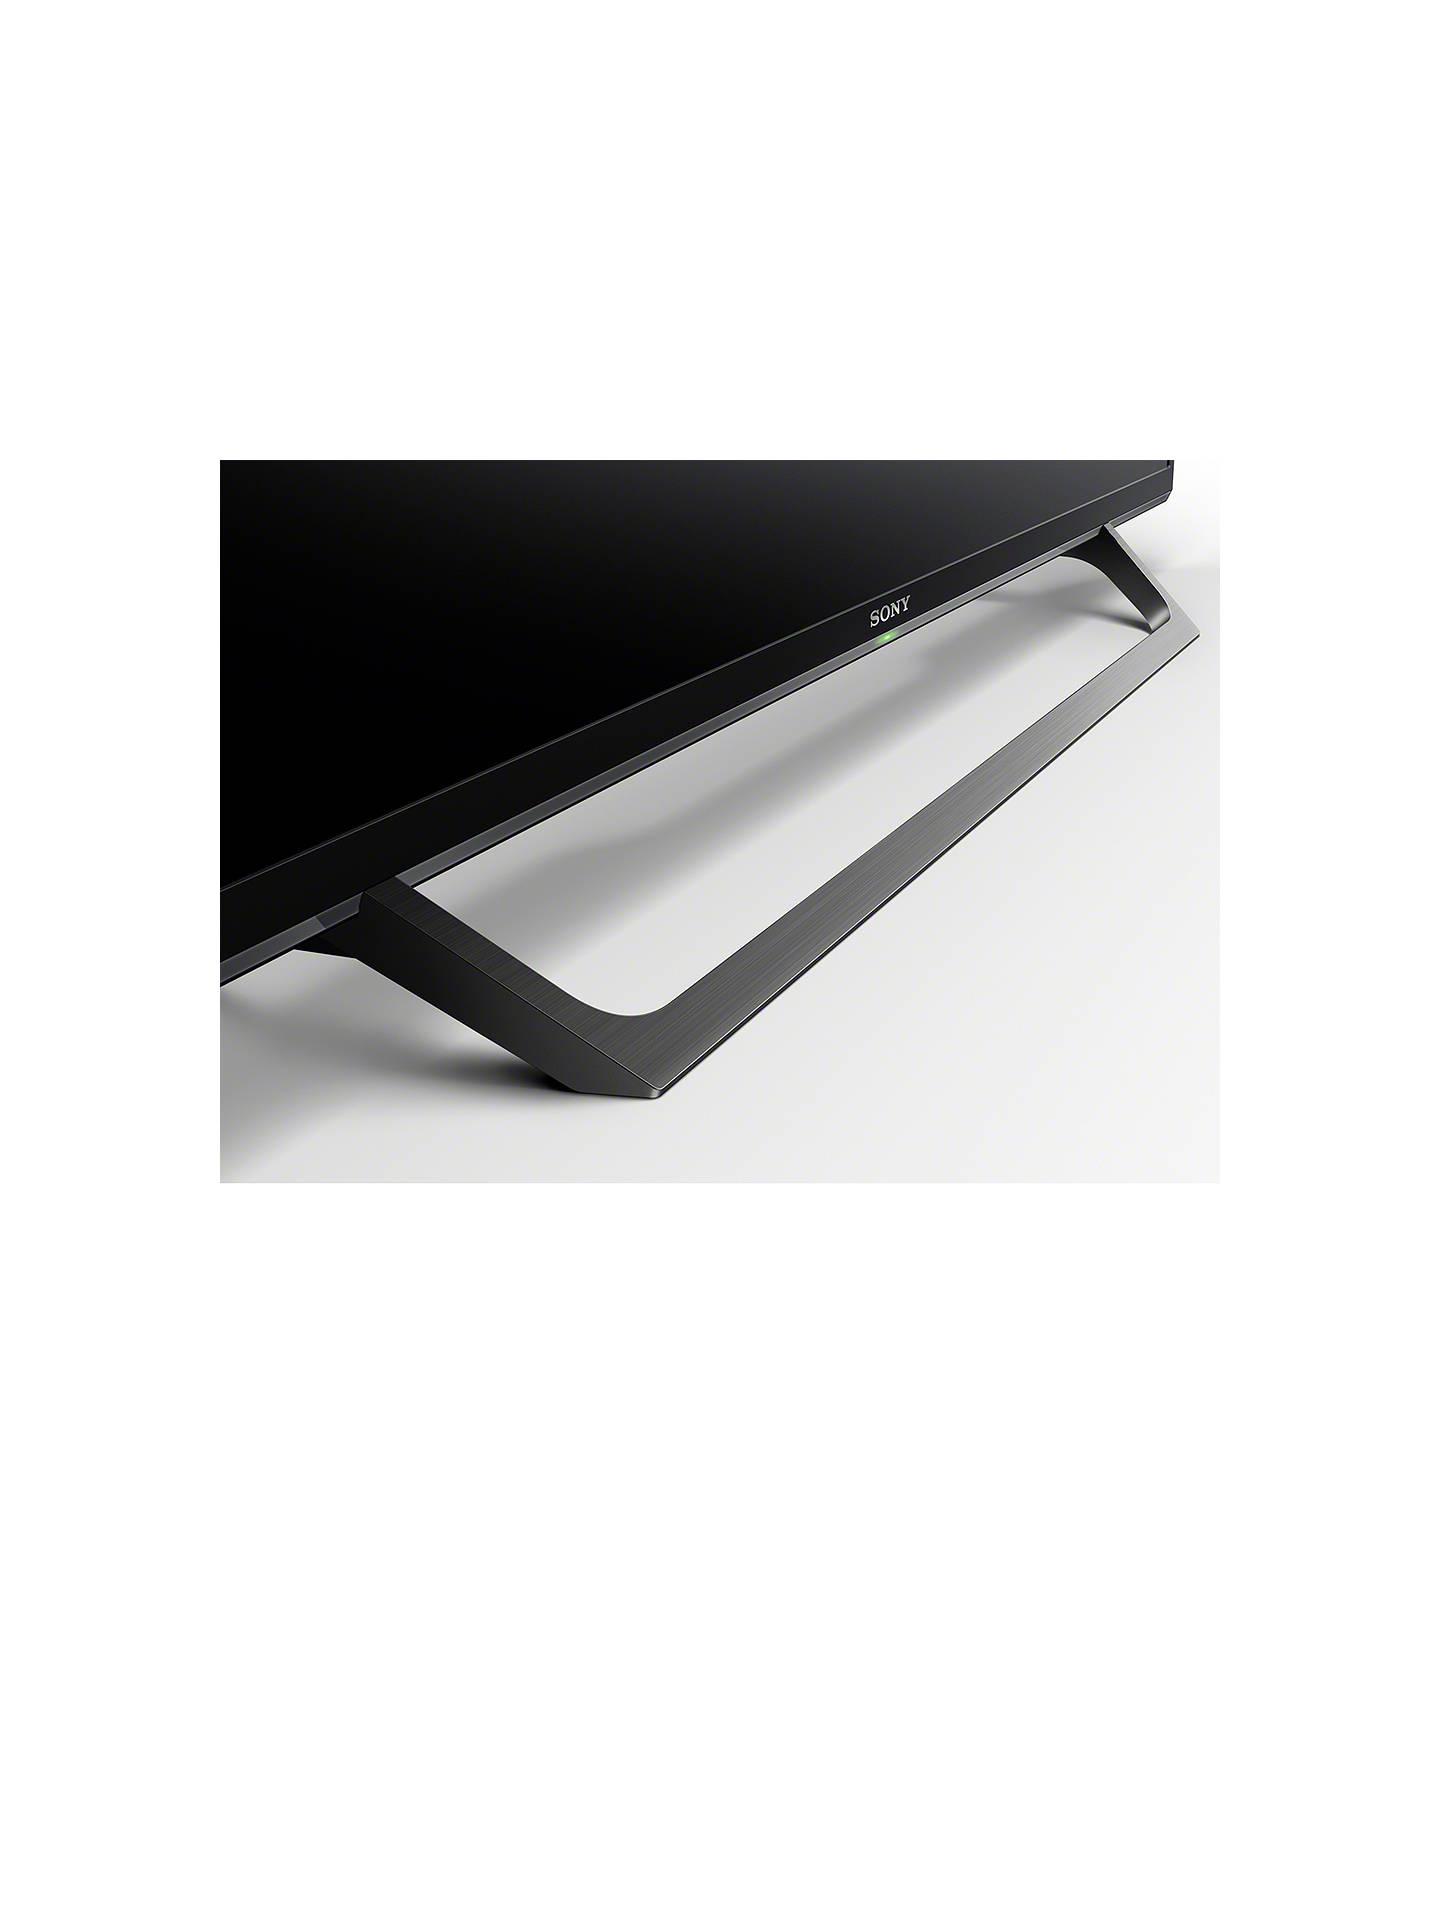 Sony Bravia KDL49WE663 LED HDR Full HD 1080p Smart TV, 49